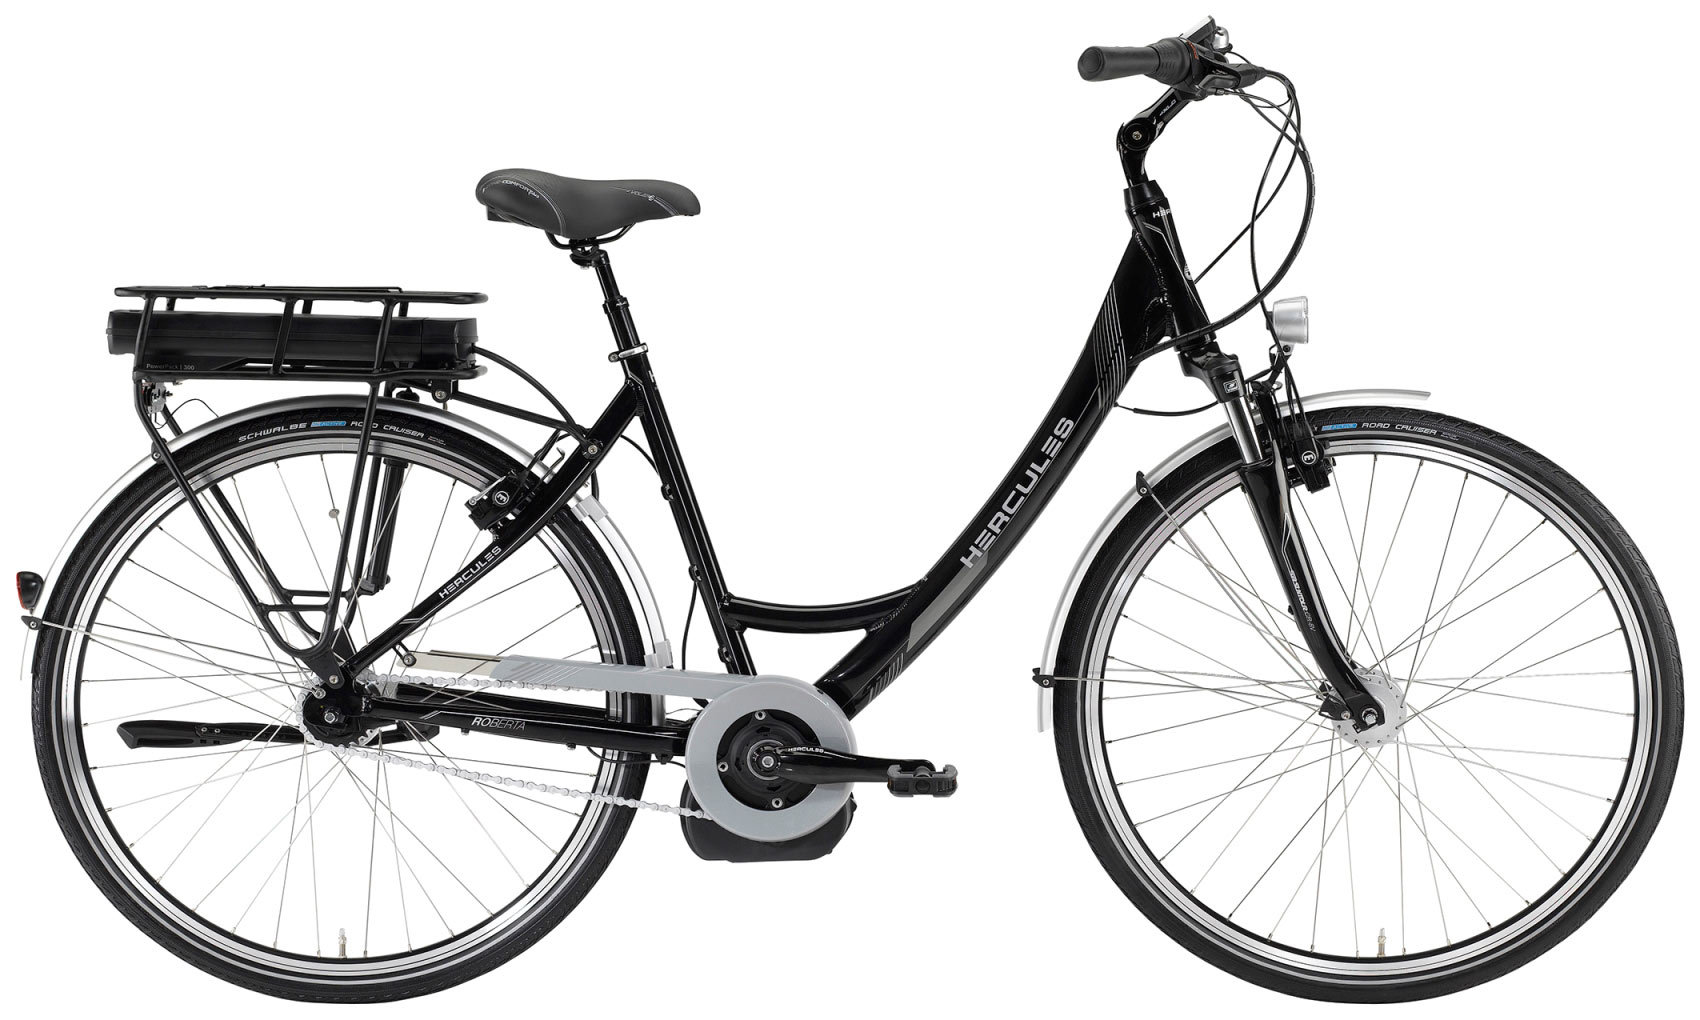 elektro fahrrad hercules roberta 7 e bike bosch shimano 7g. Black Bedroom Furniture Sets. Home Design Ideas